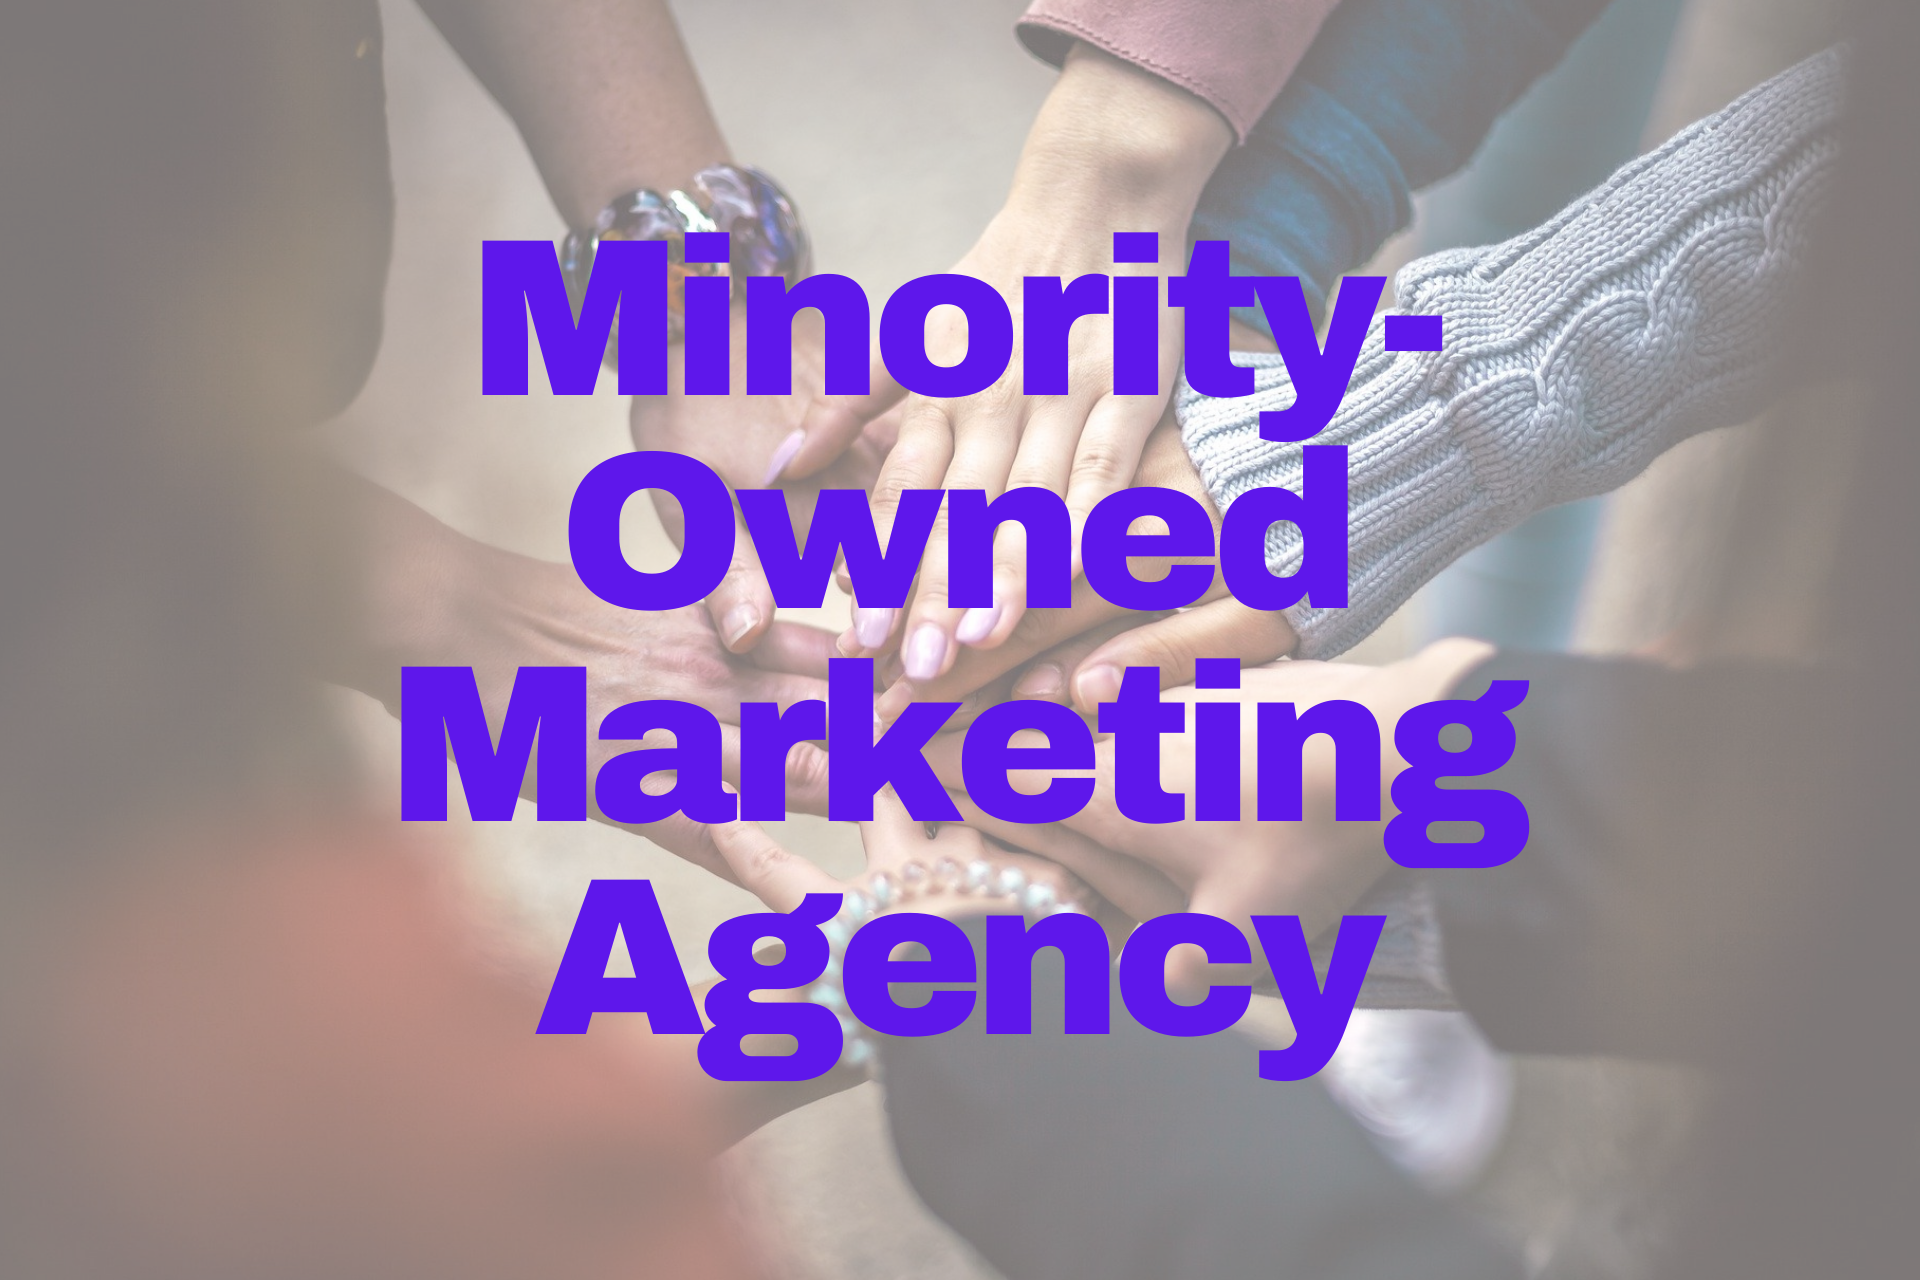 minority-owned marketing agency